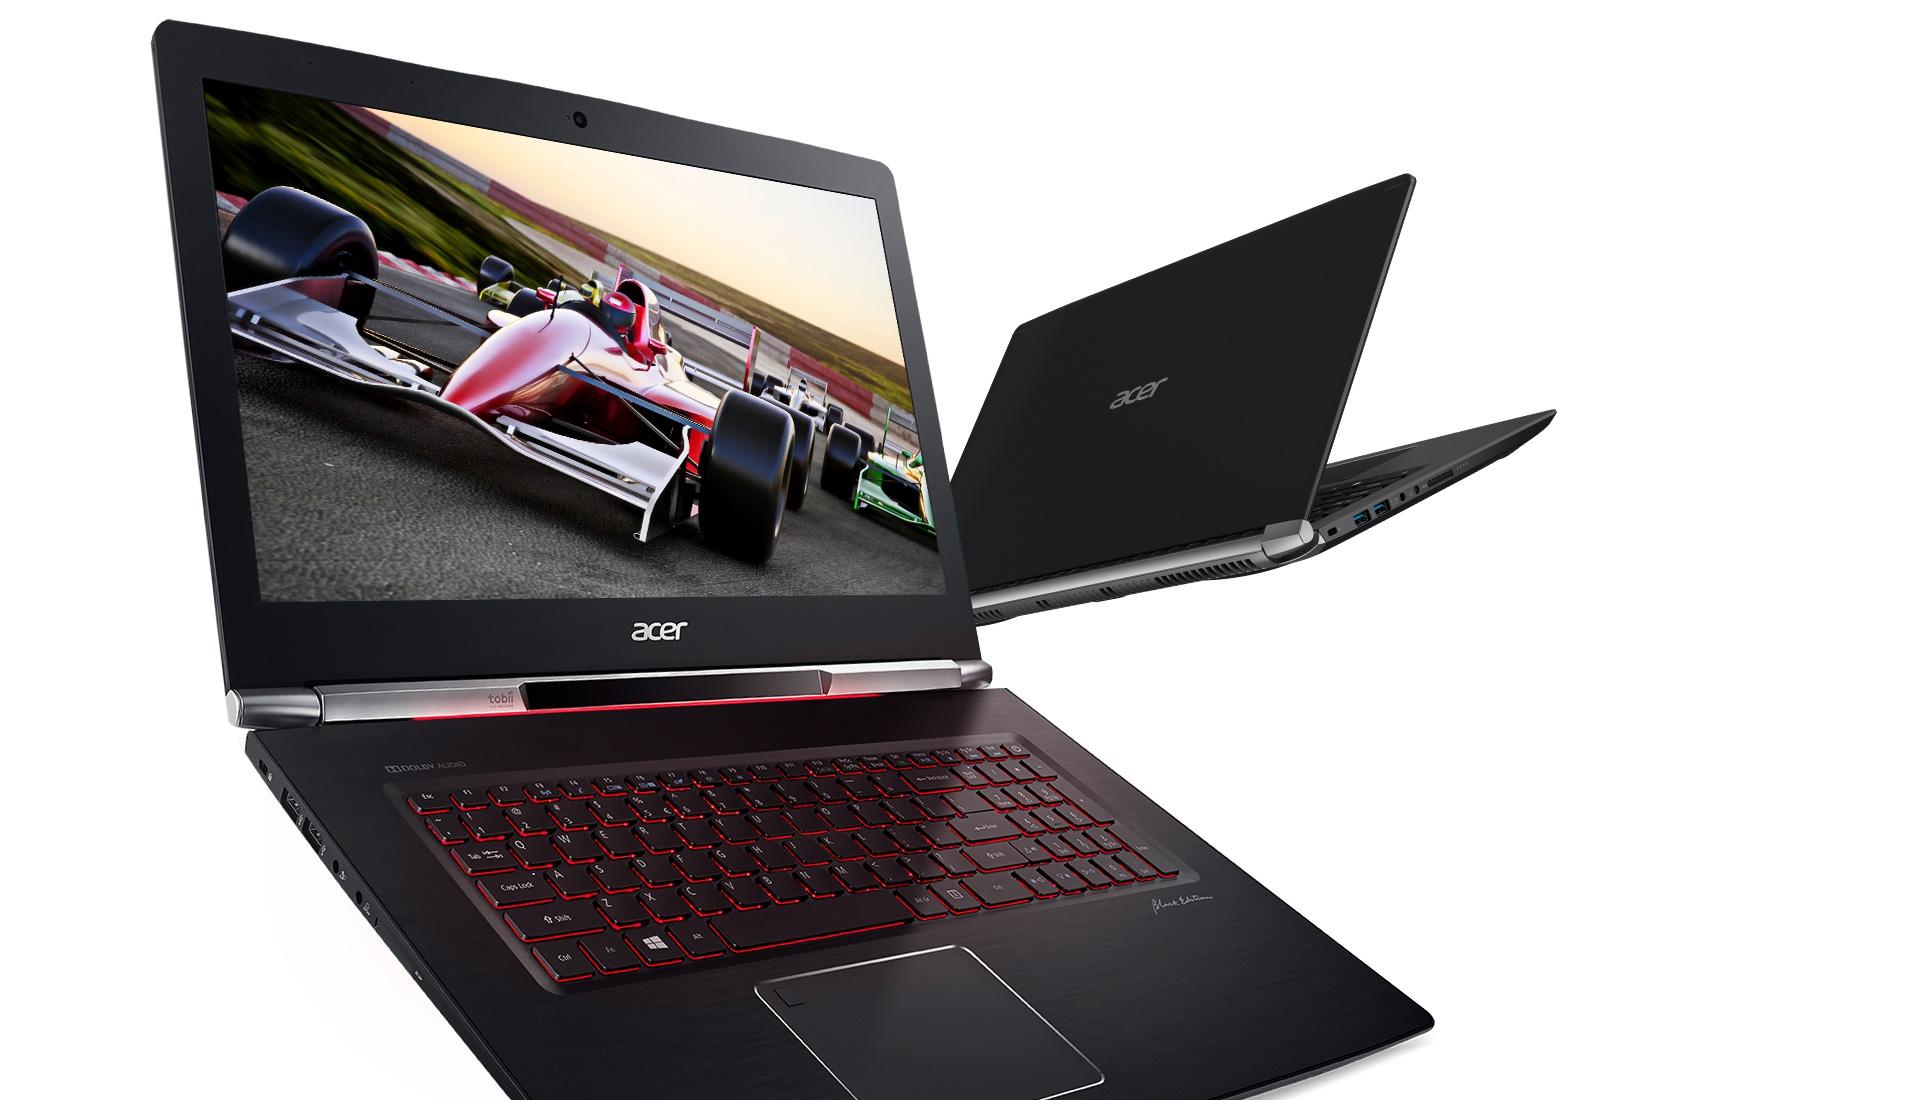 Acer Aspire V Nitro Gtx 1060 Gaming Laptop Price In Pakistan Buy Acer 17 3 Core I7 7th Generation Geforce Gtx Laptop Vn7 793g 709a Ishopping Pk